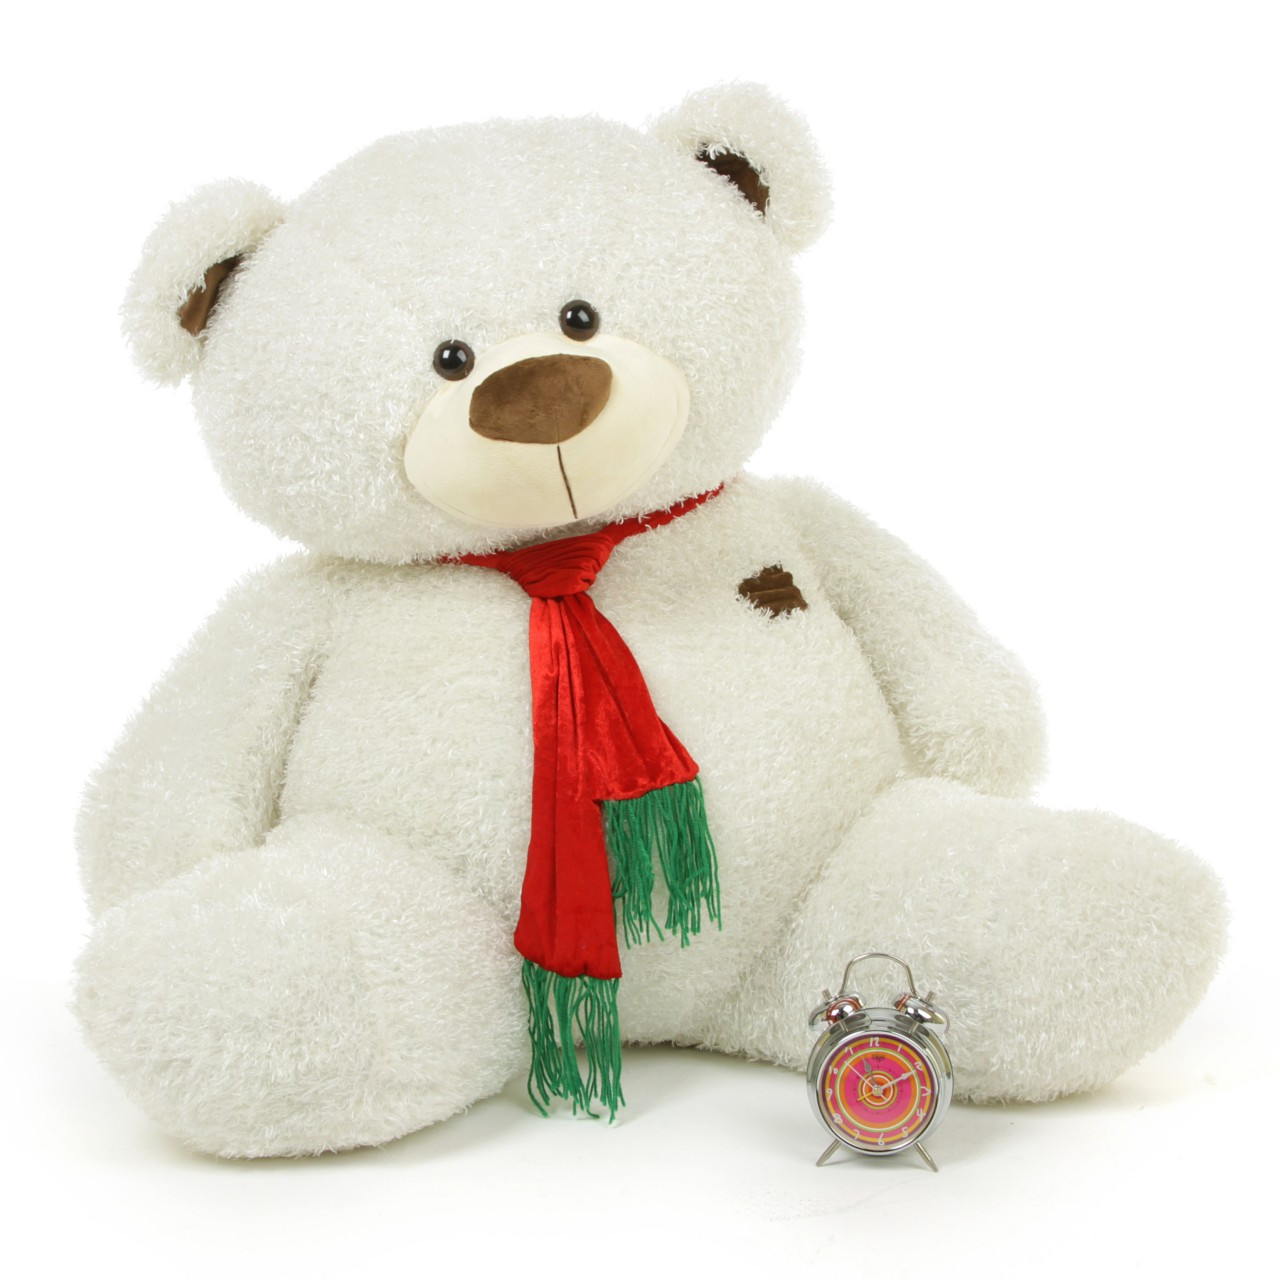 White Teddy Bear with Christmas Scarf